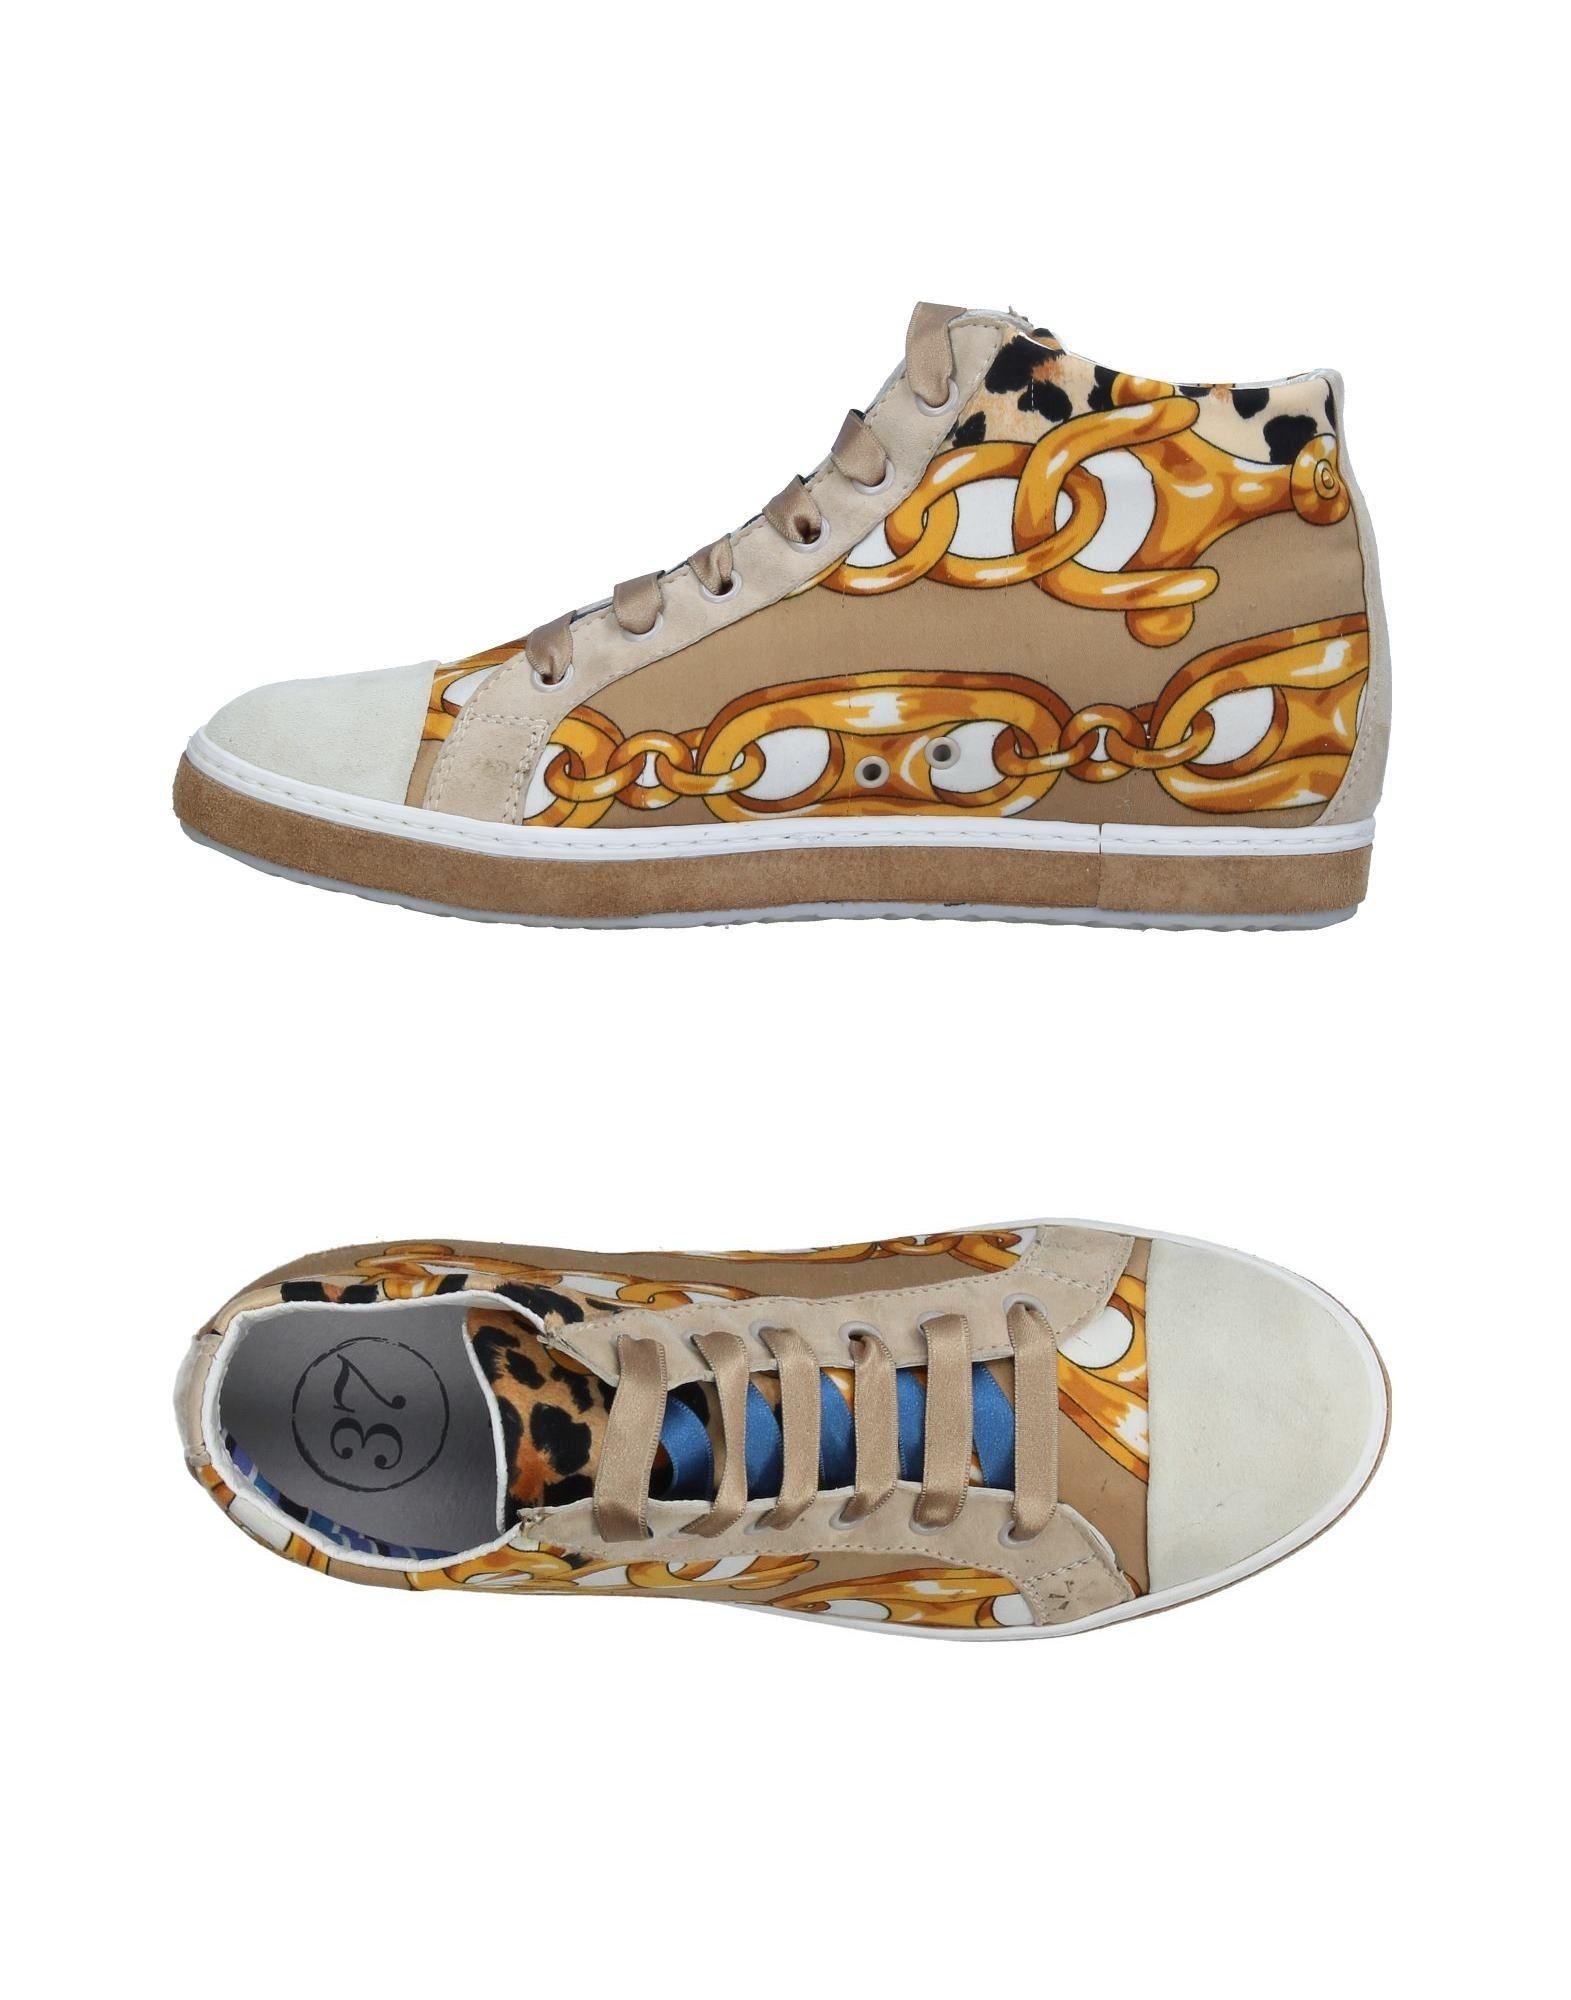 SOISIRE SOIEBLEU Damen High Sneakers & Tennisschuhe Farbe Beige Größe 7